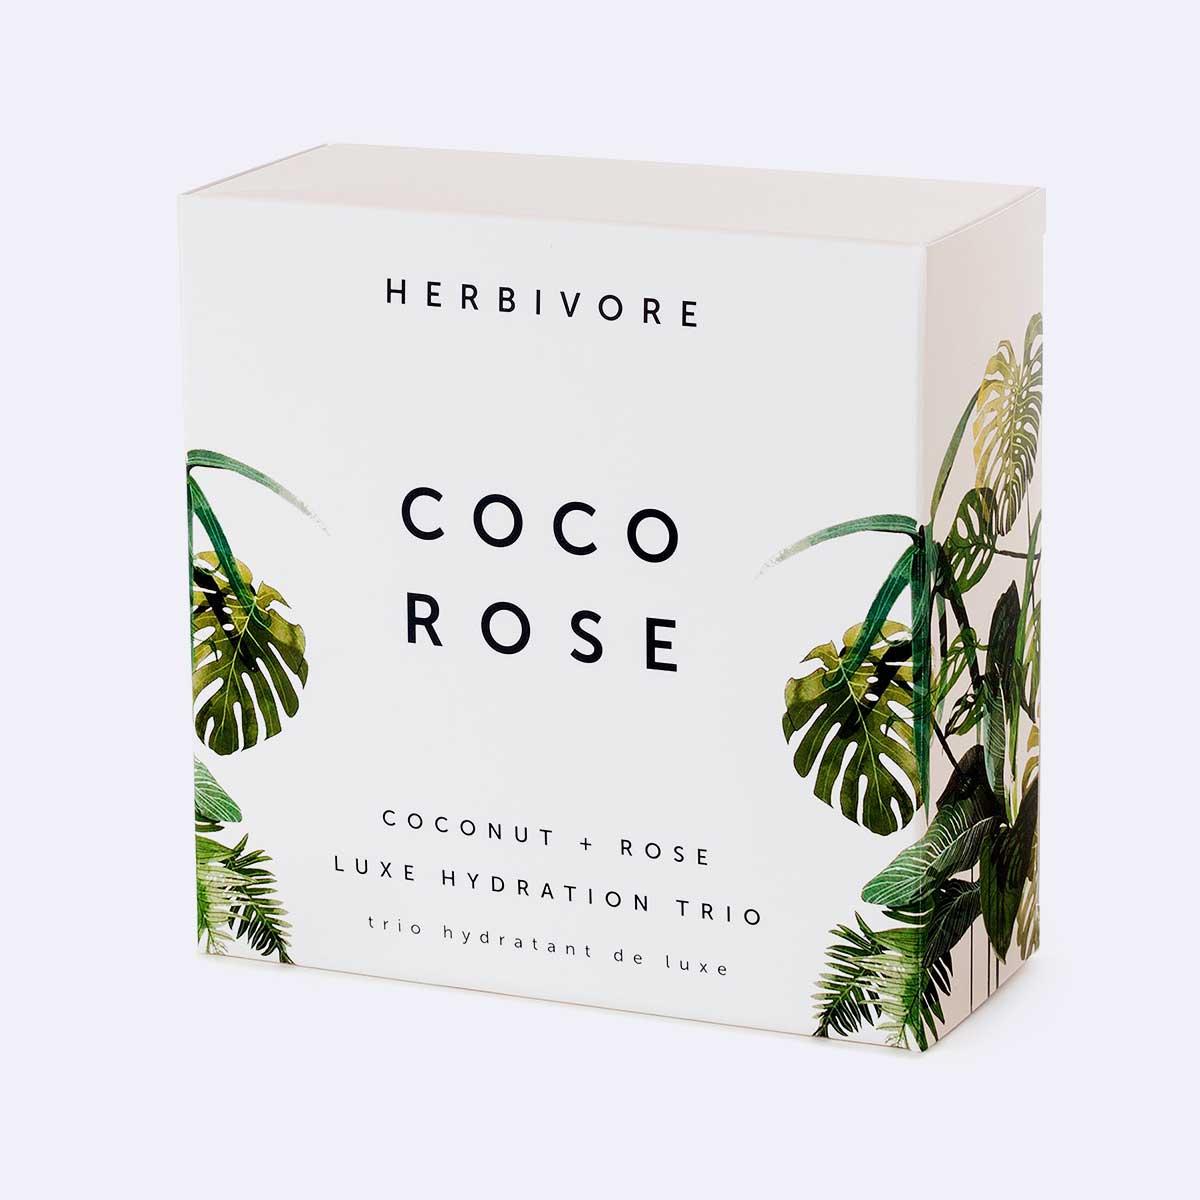 Coco Rose Luxe Hydration Trio